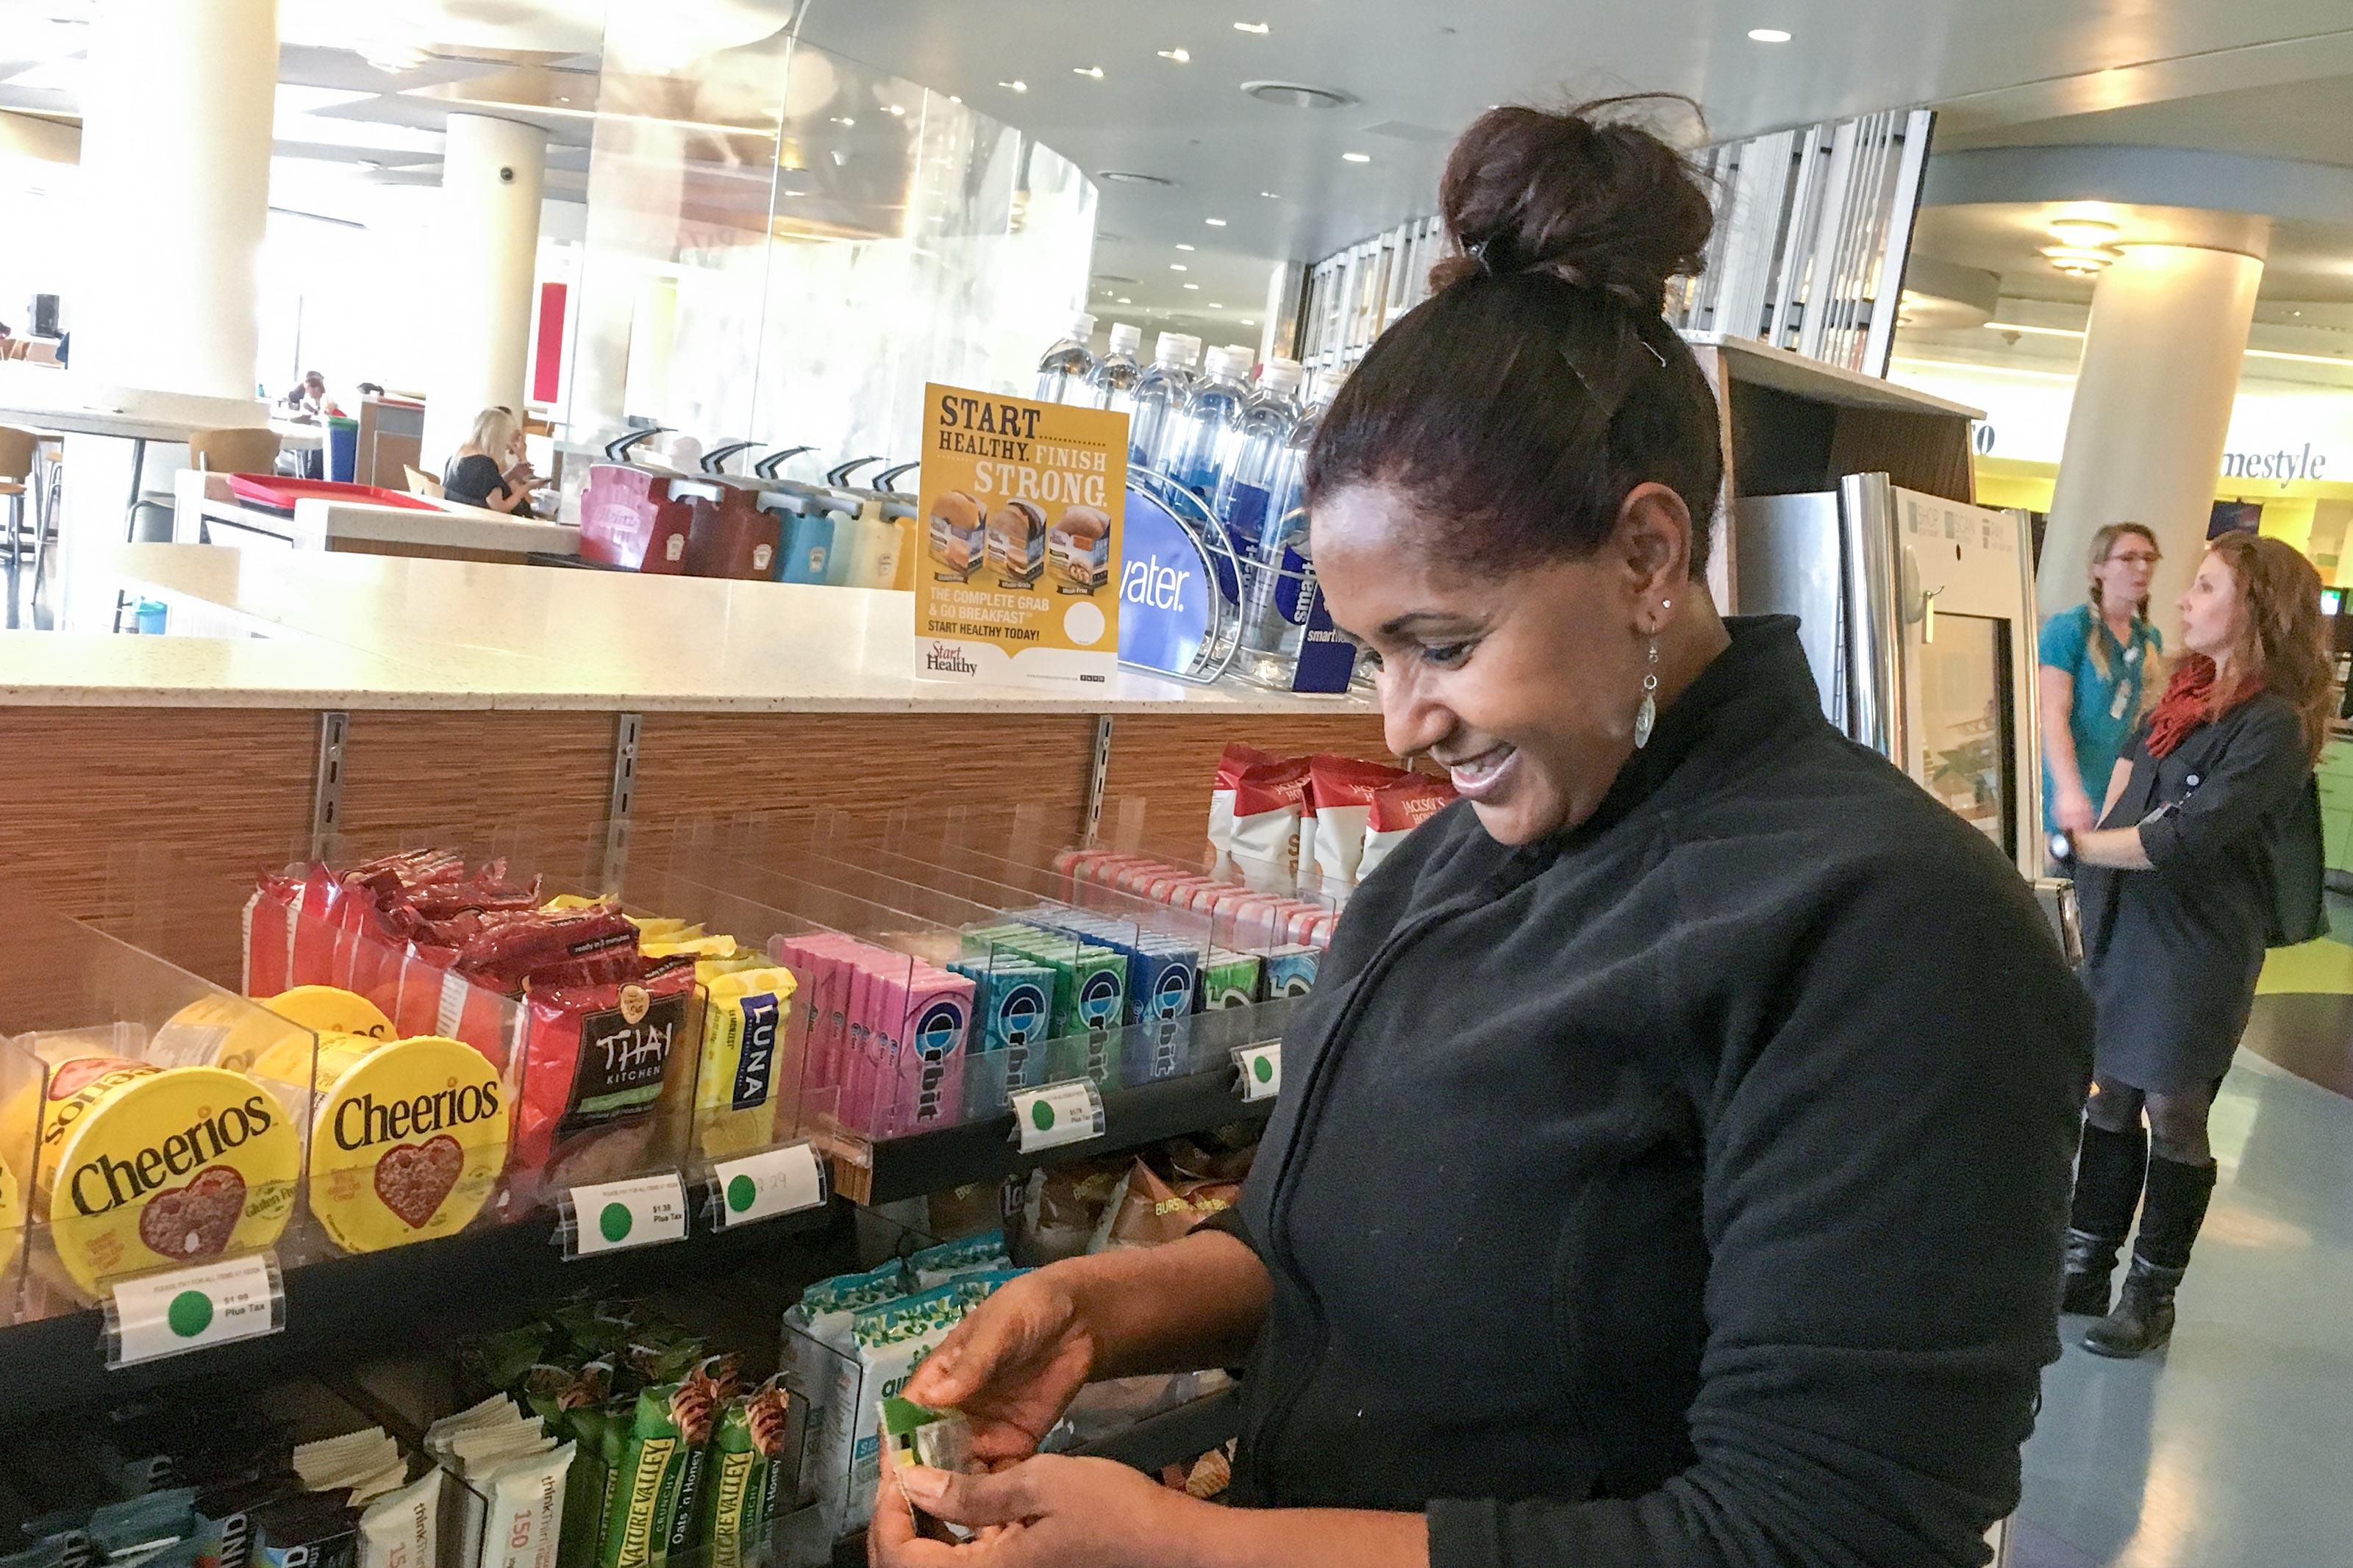 Photo: Healthy Hospitals 3   Children's Cafeteria Snacks - JDaley